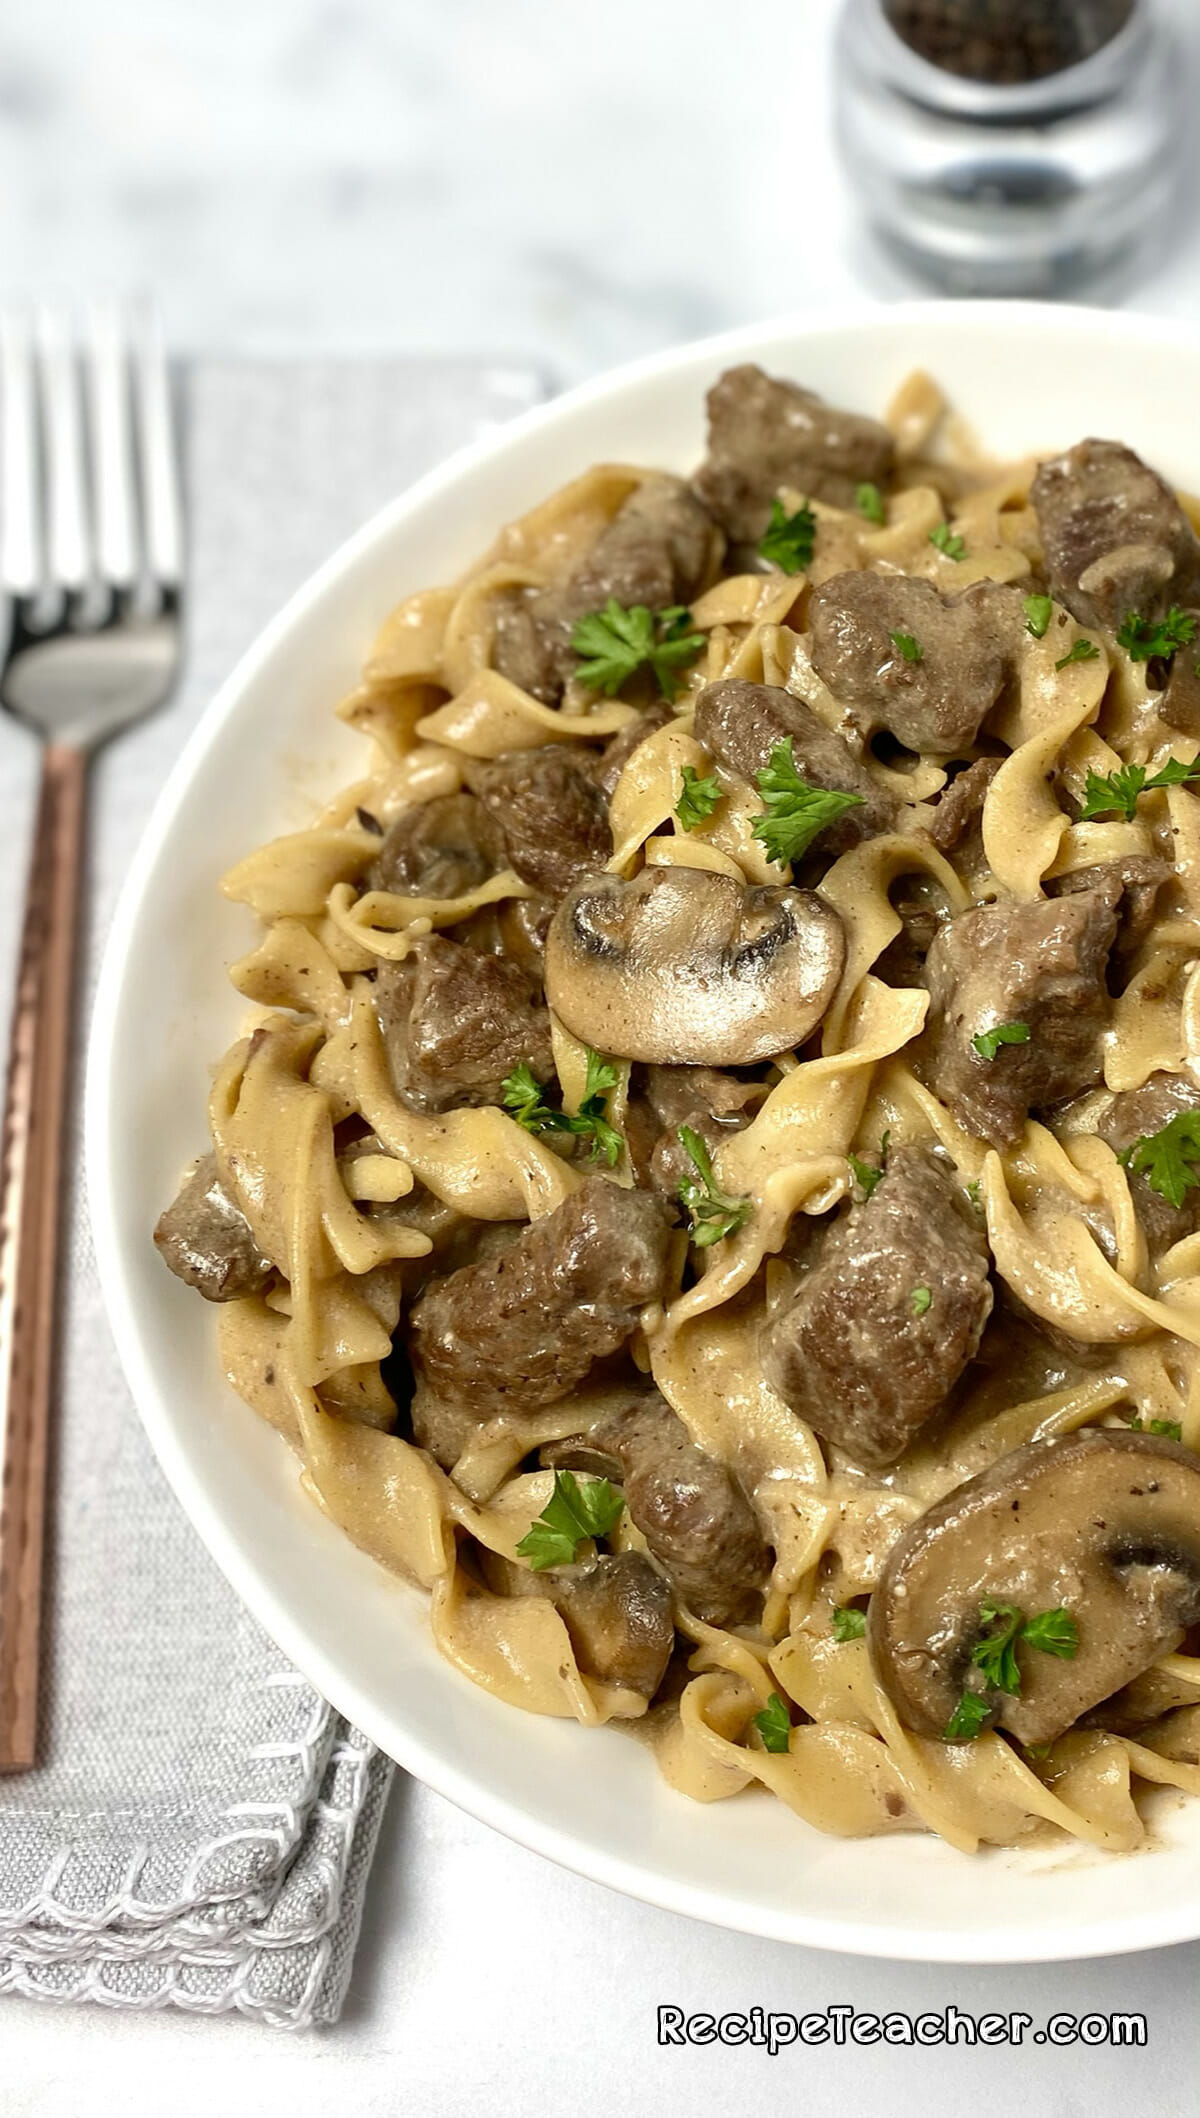 Recipe for Instant Pot Beef Stroganoff